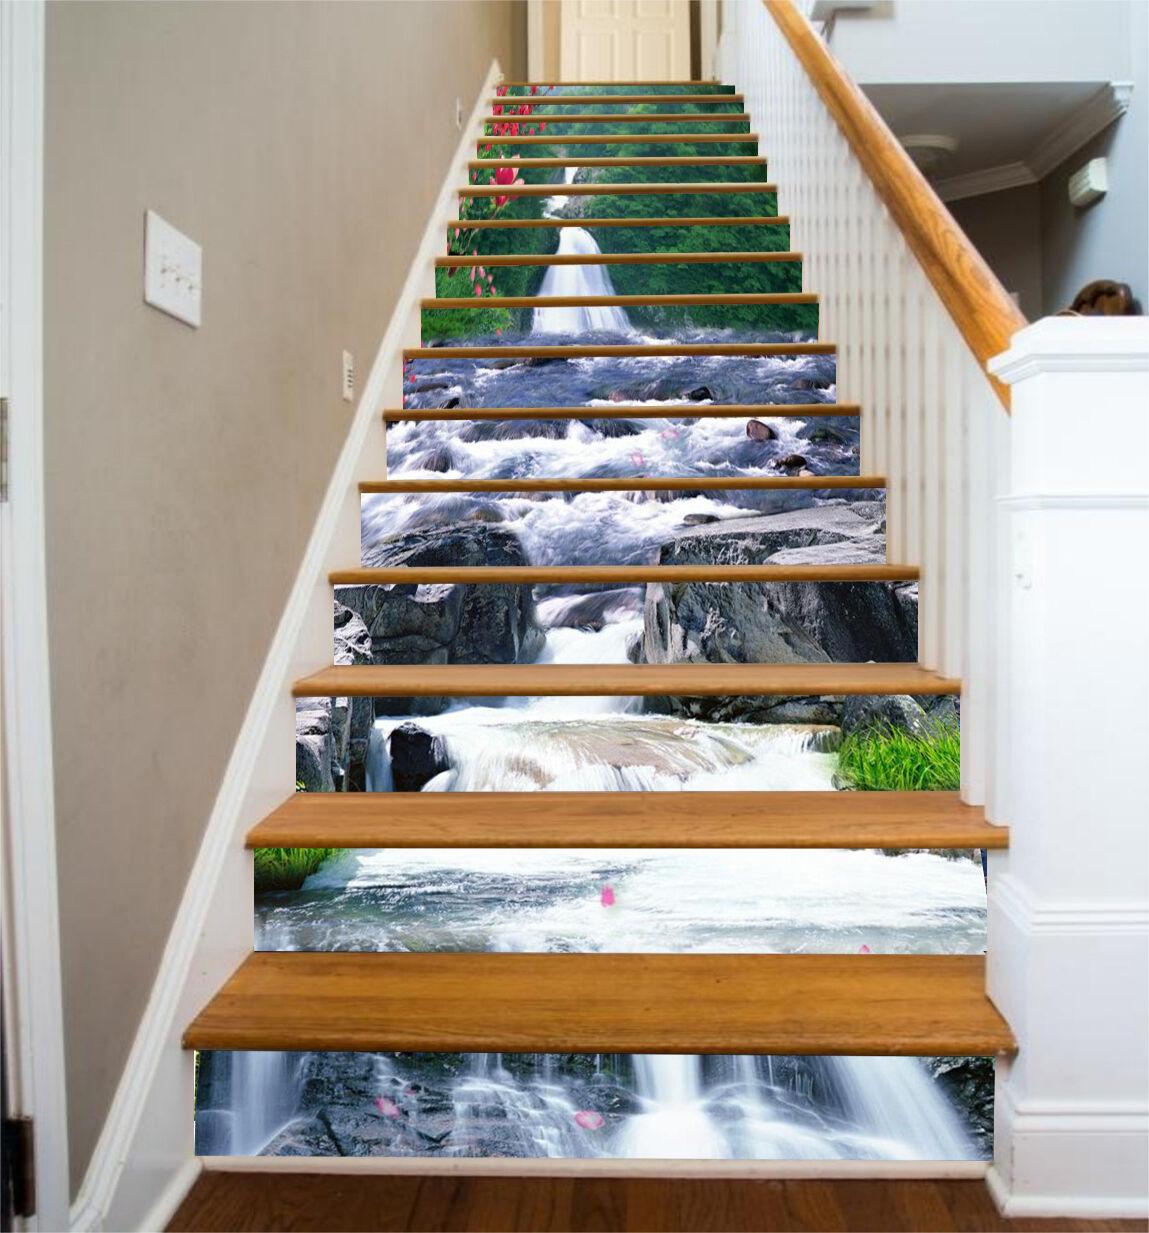 3D Stream Squid 72 Stair Risers Decoration Photo Mural Vinyl Decal Wallpaper CA